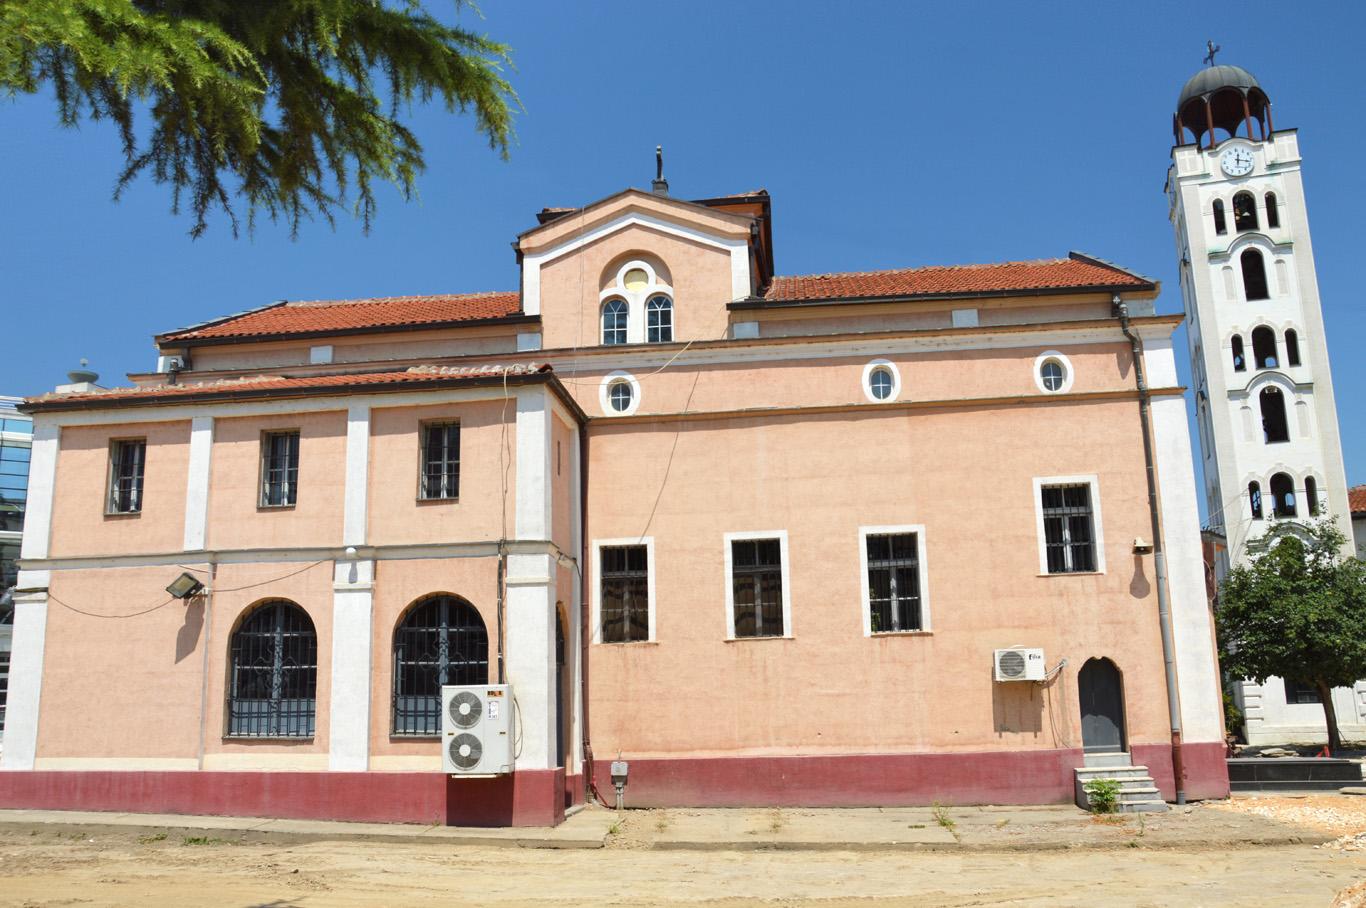 Church of St. Demetrius - right in front of Skopje